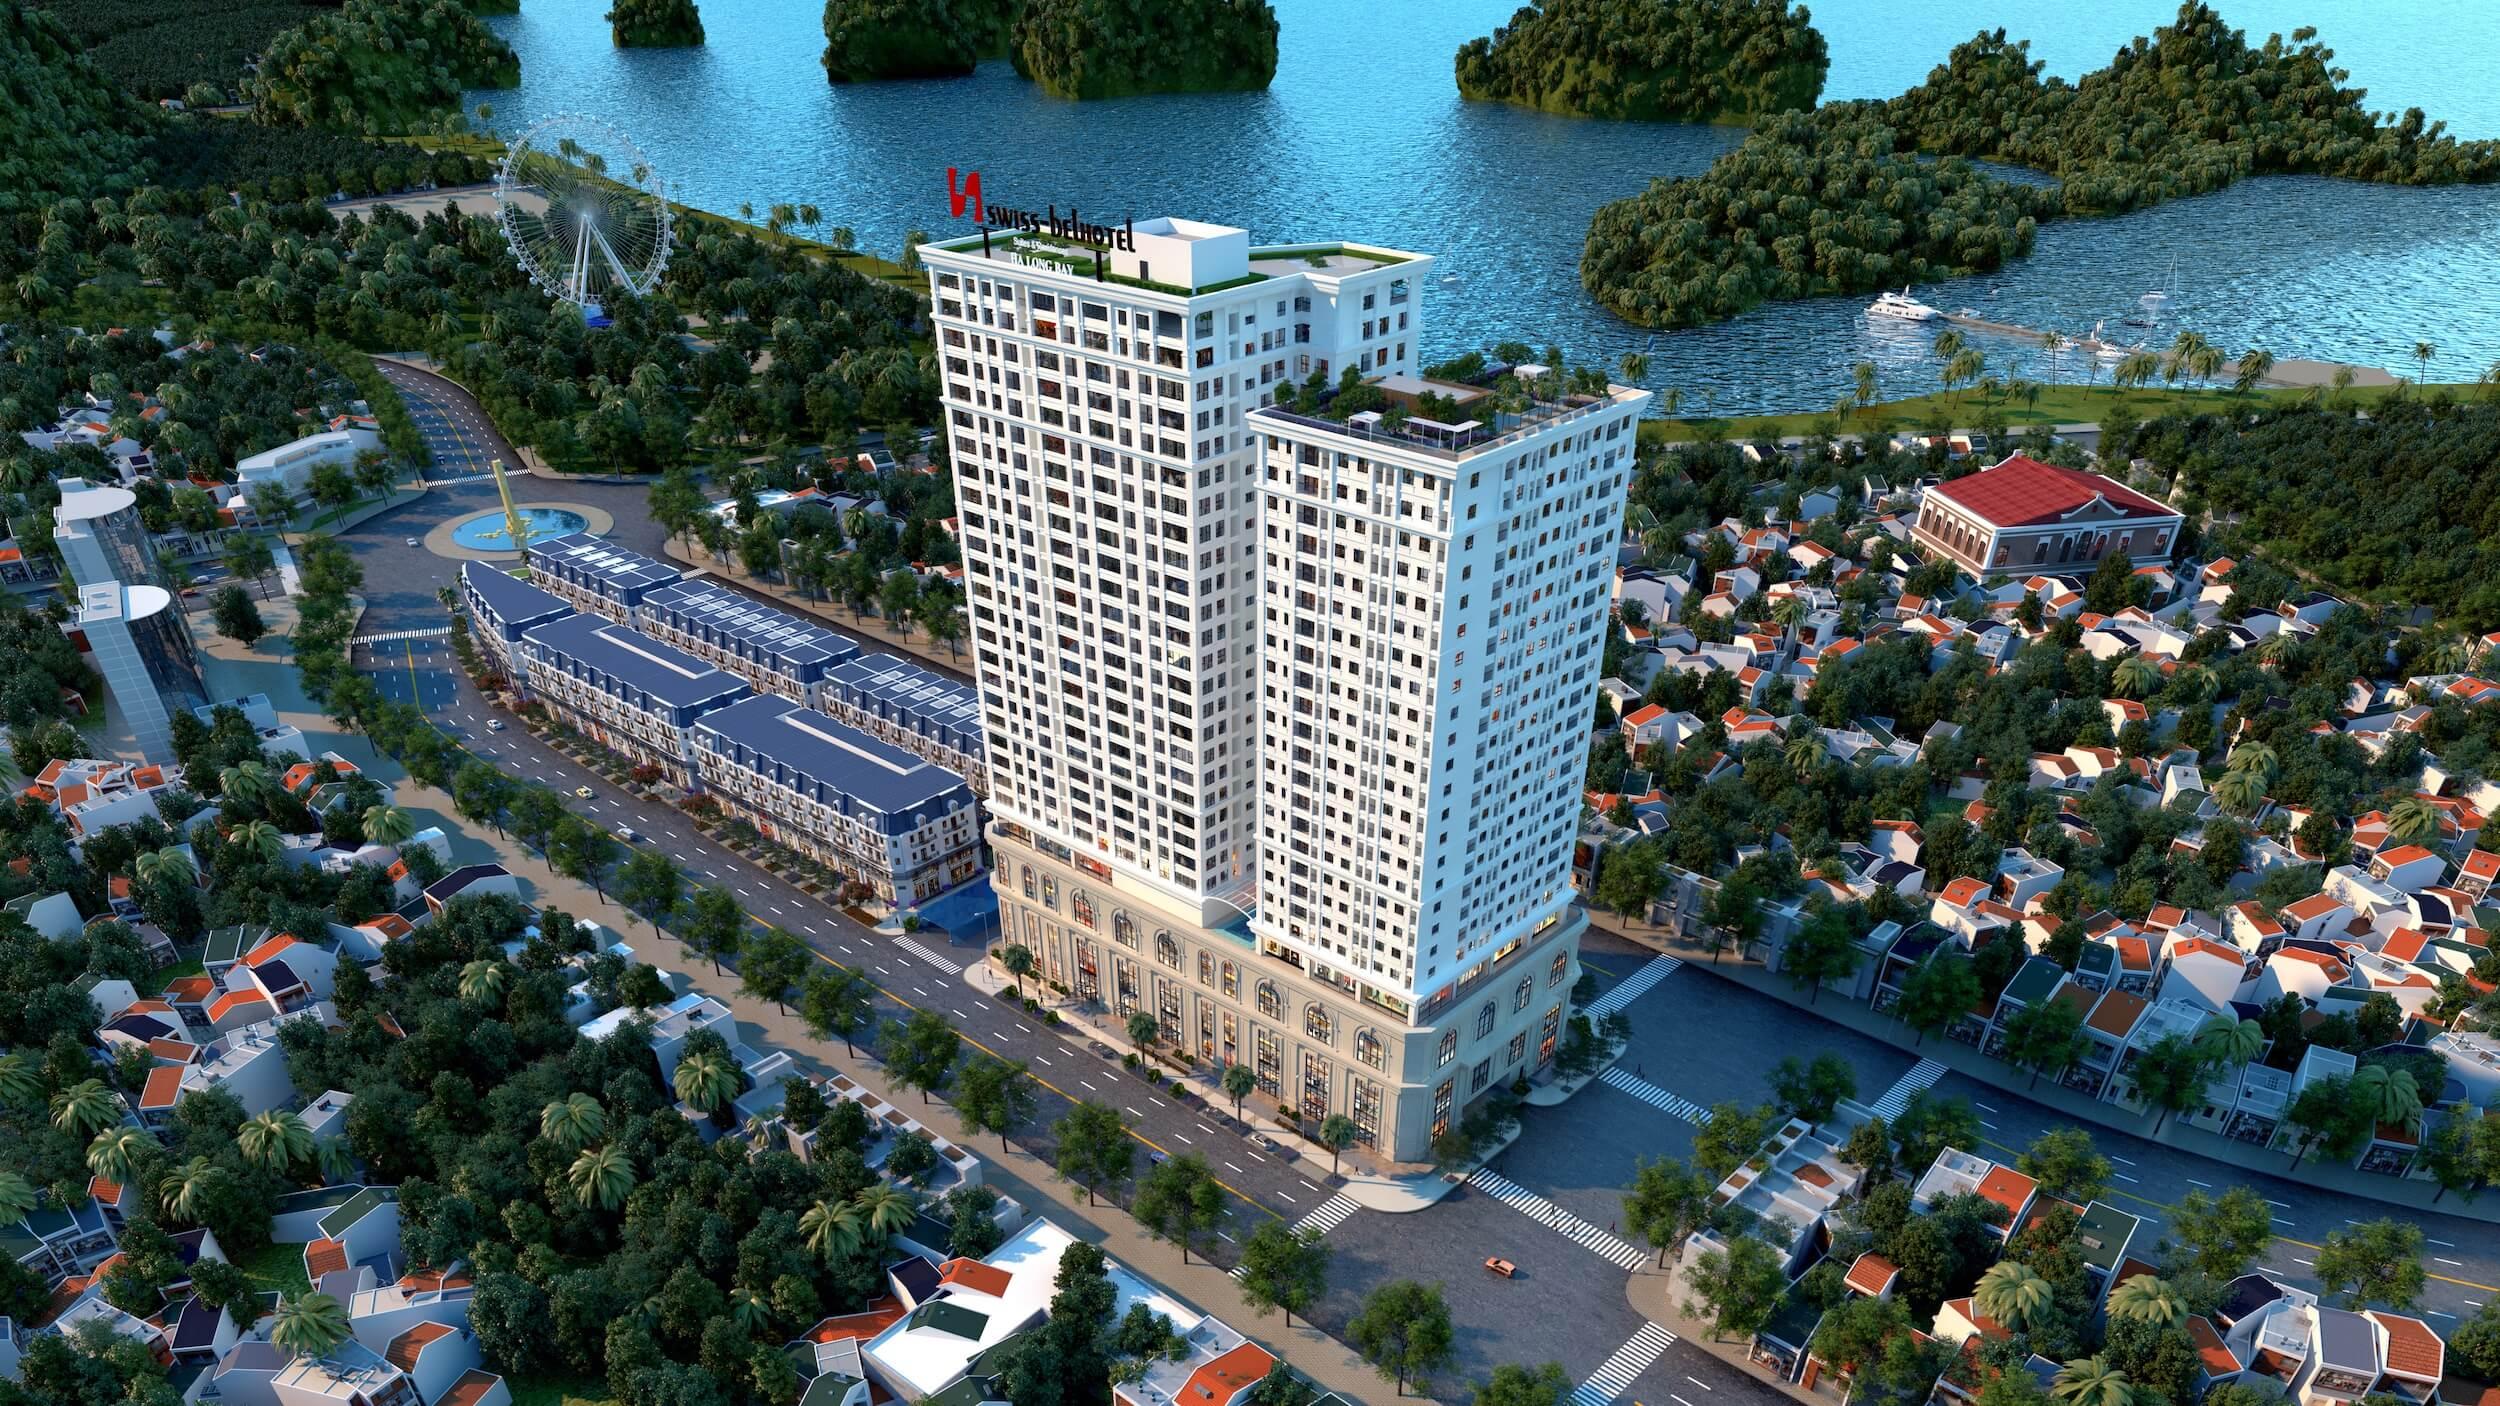 Swiss-Belhotel International presenta ambiciosos plans de expansión en Vietnam